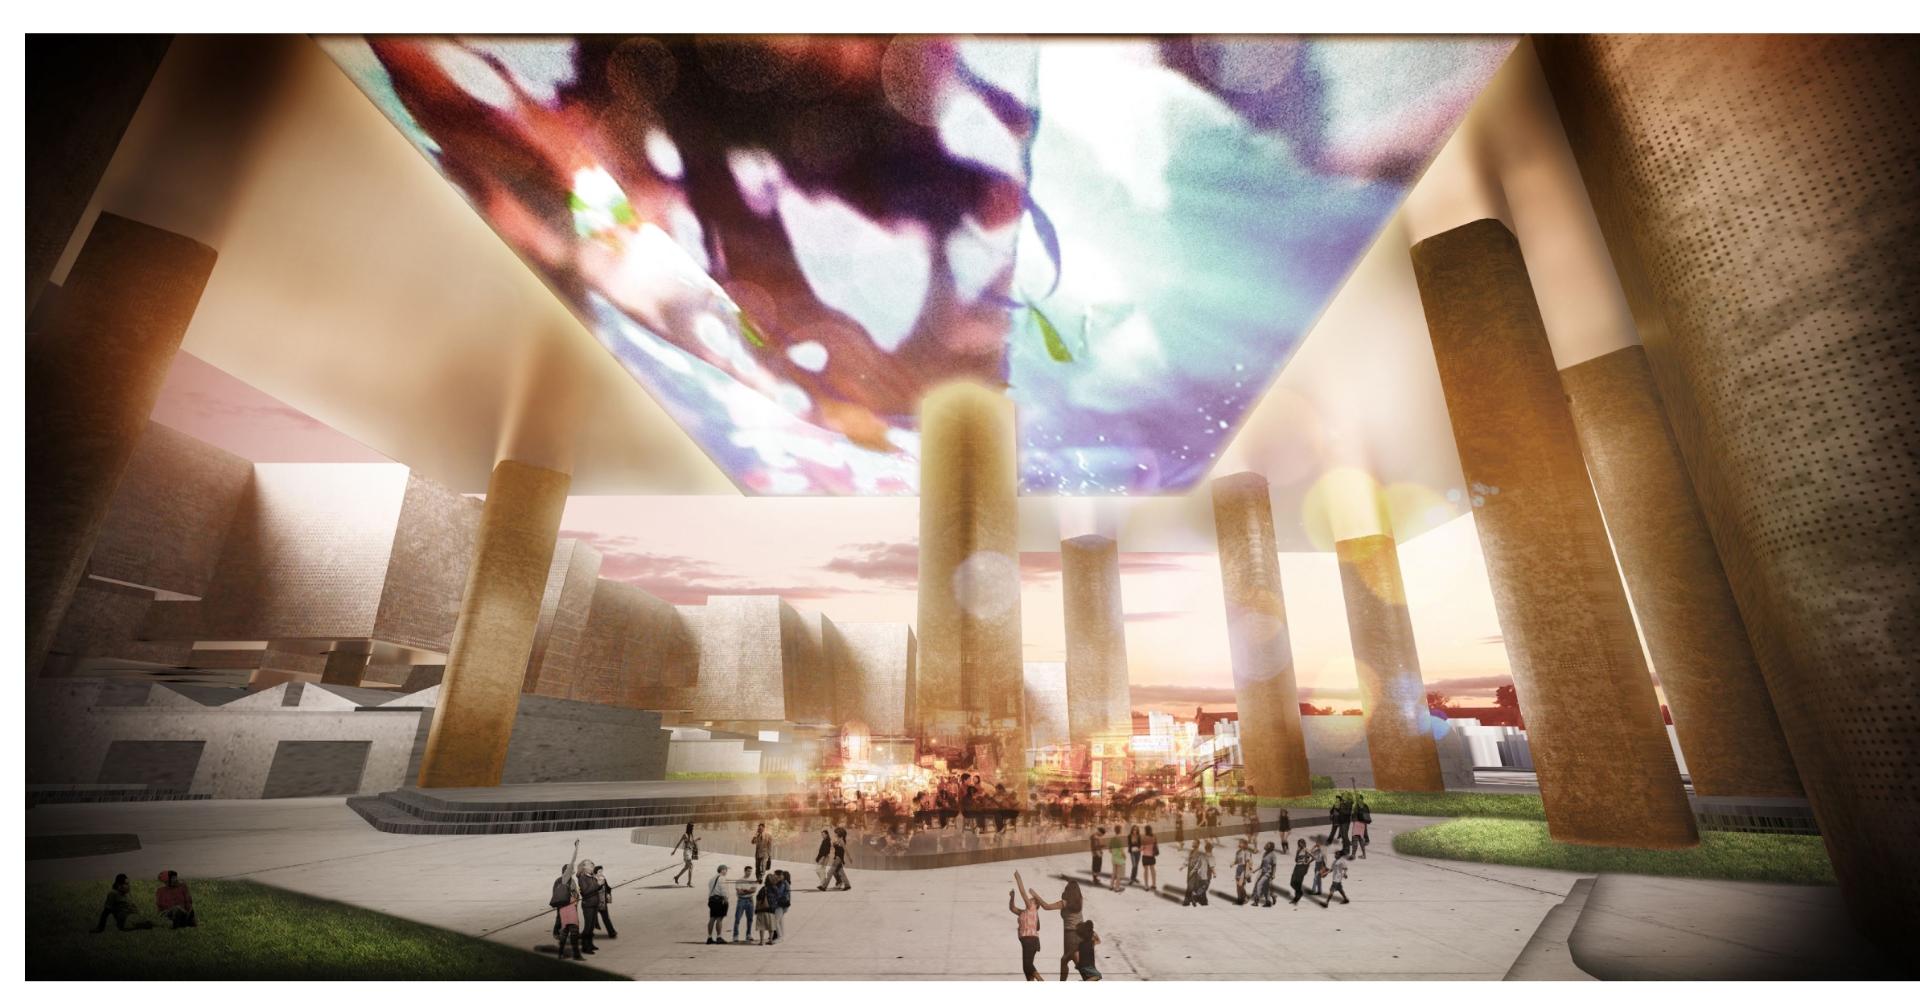 Enlarge Photo: Architecture & Urban Design II (ARCH 4002) 6